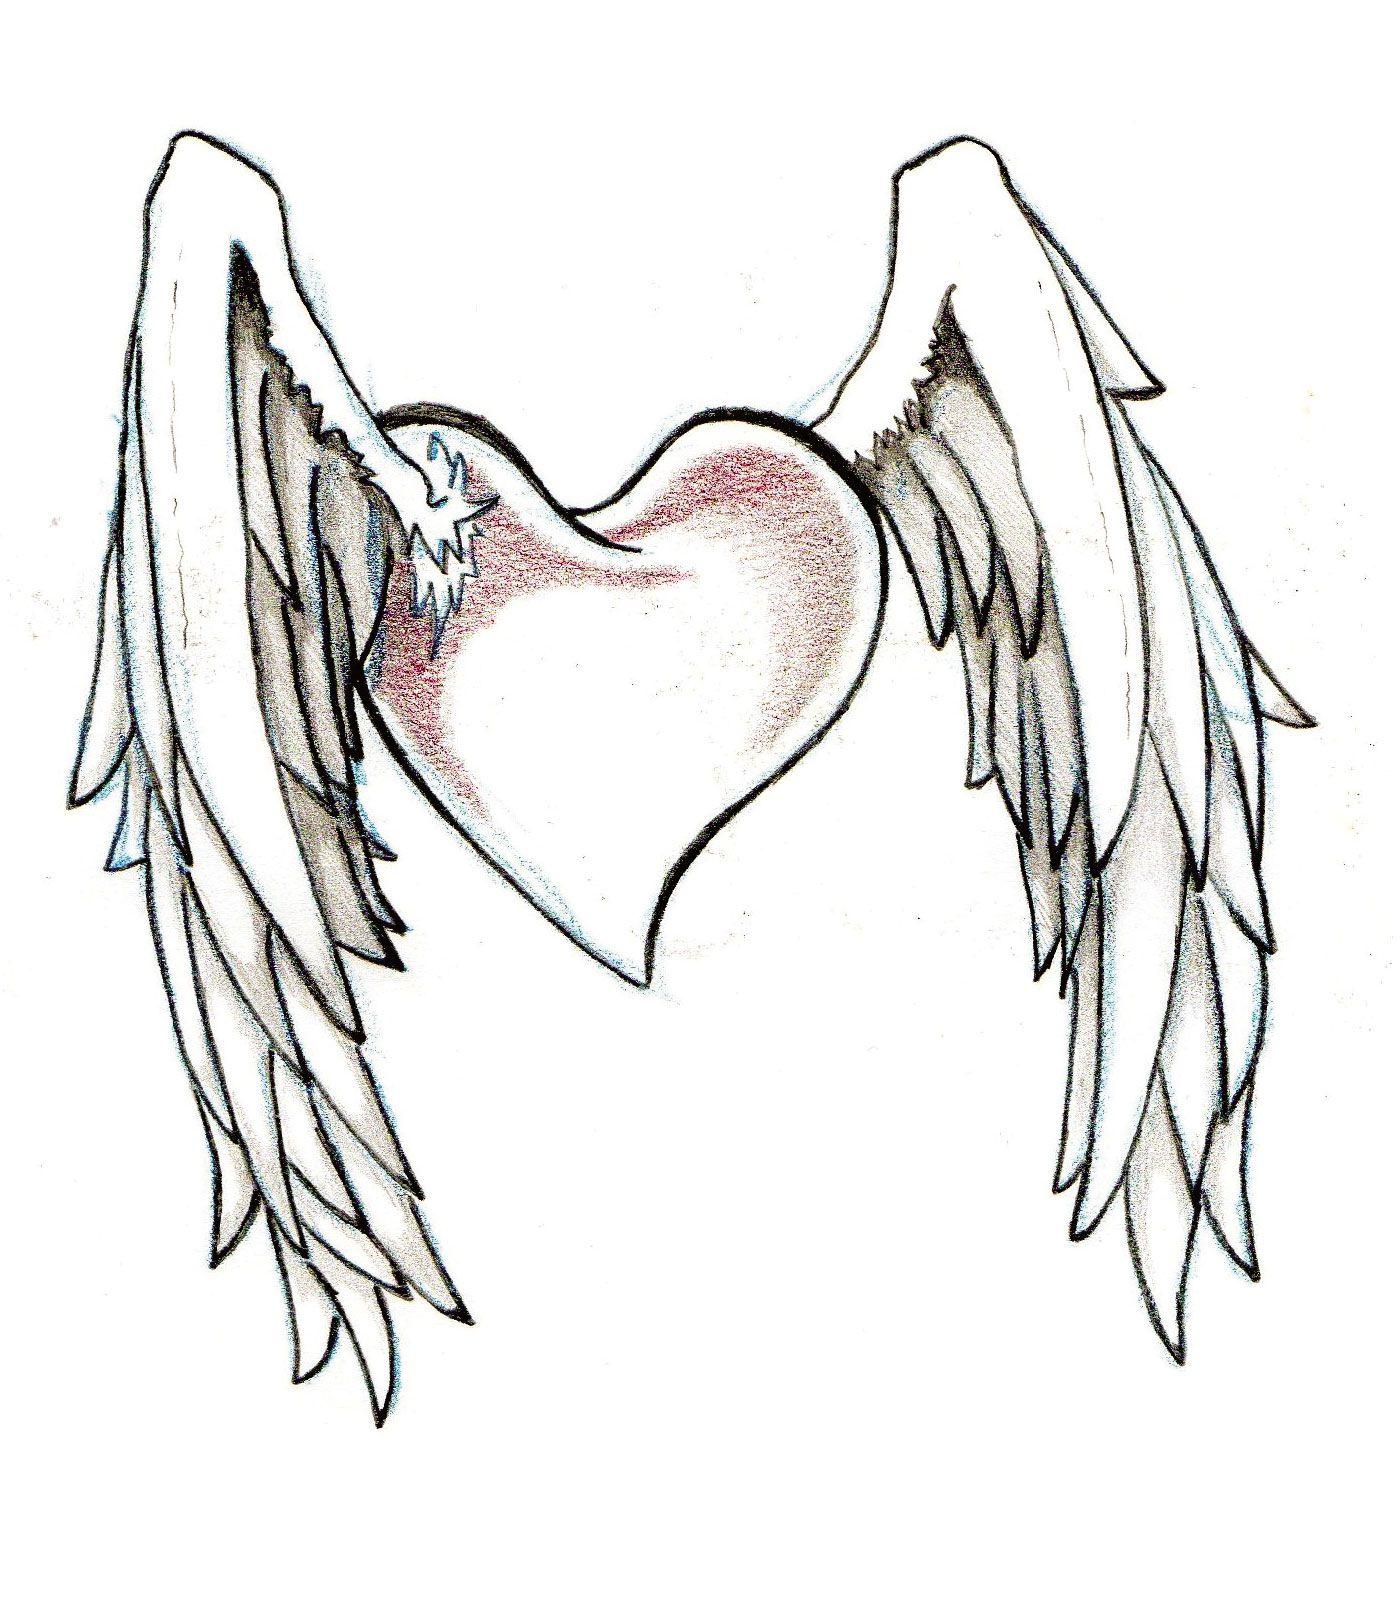 Heart tattoos designs - Hearts And Wings Tattoo Designs Cool Tattoos Bonbaden